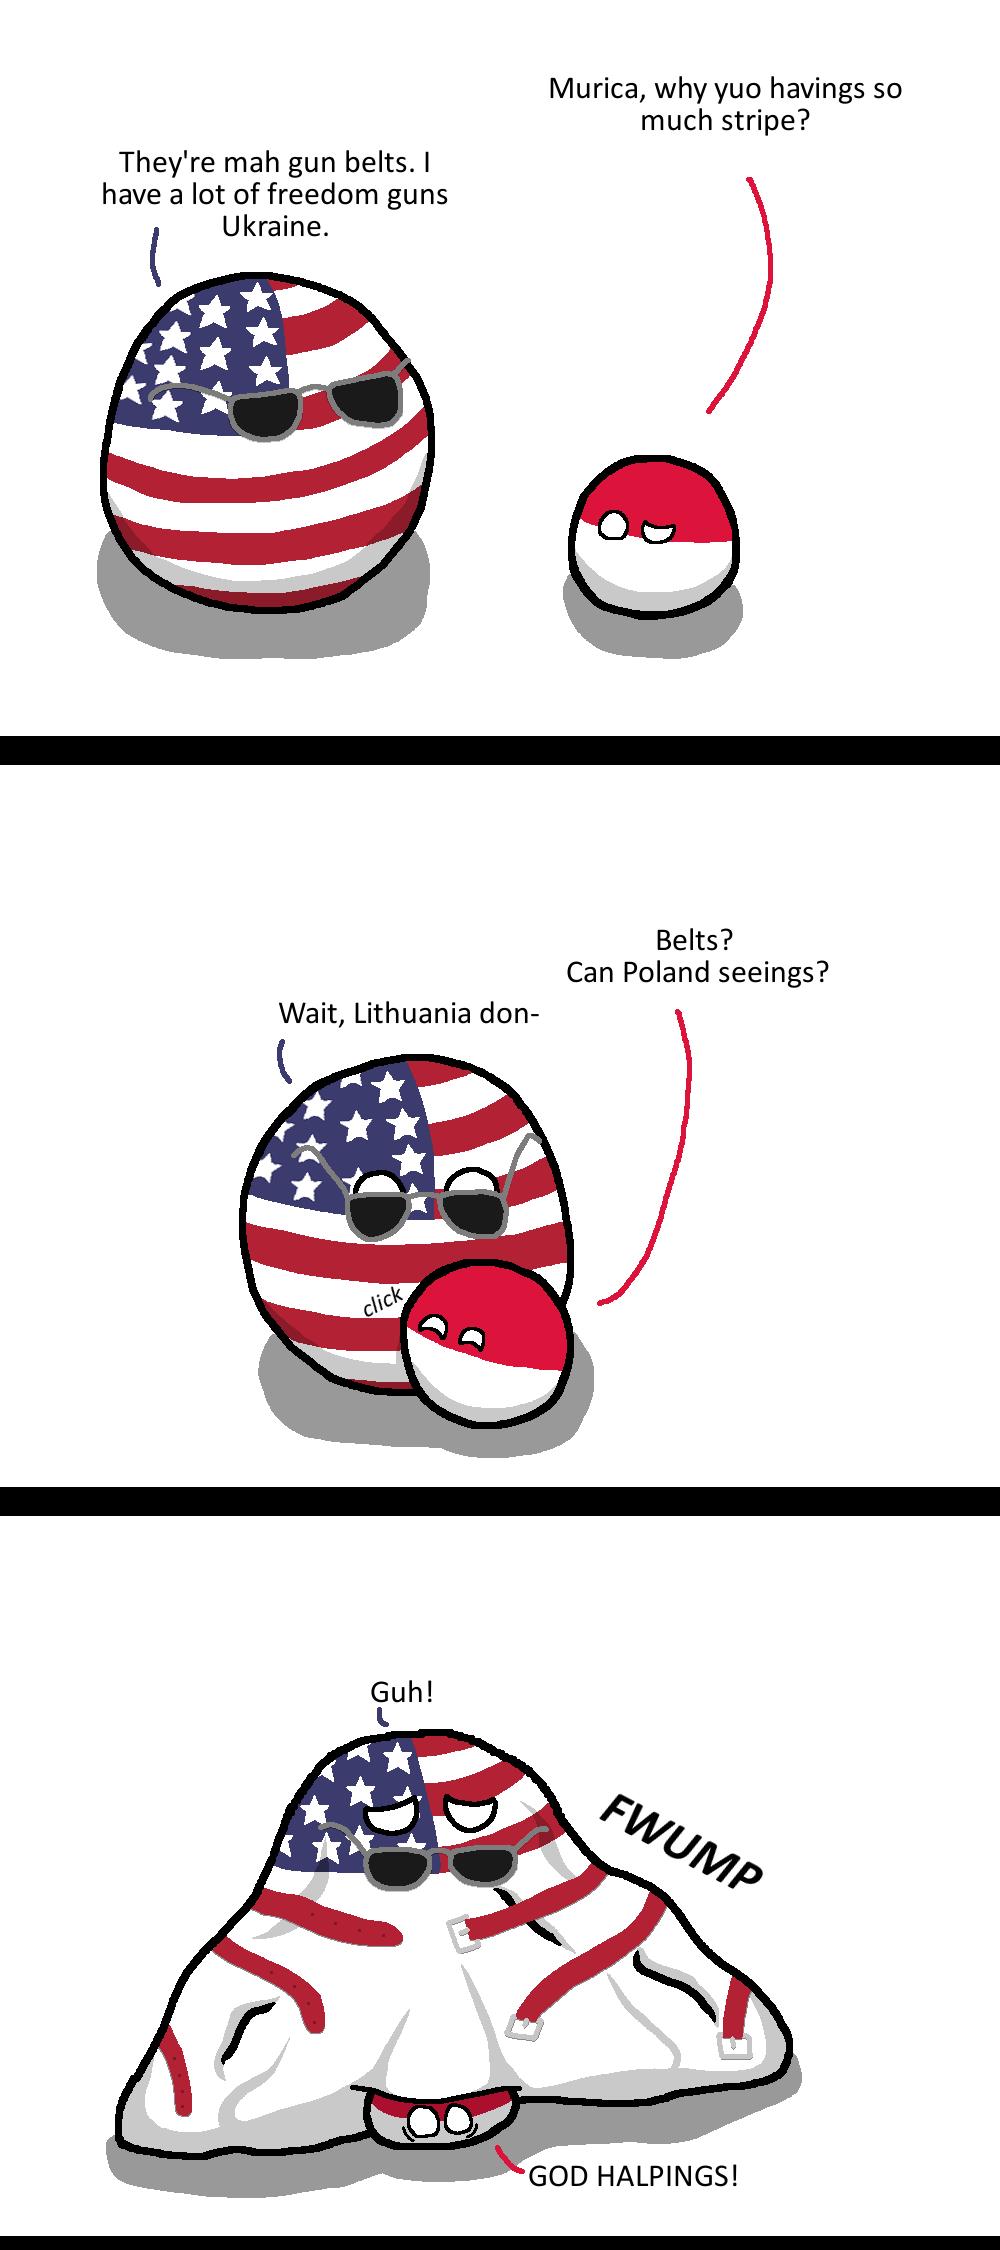 country-balls-america-s-stripes